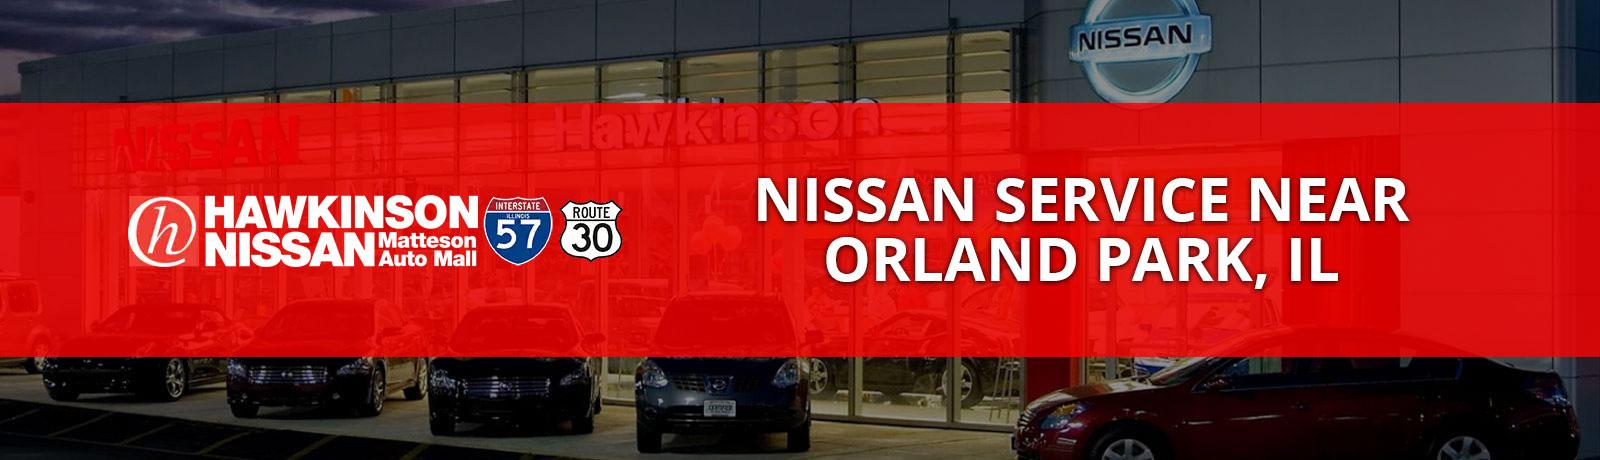 Nissan Service near Orland Park, IL